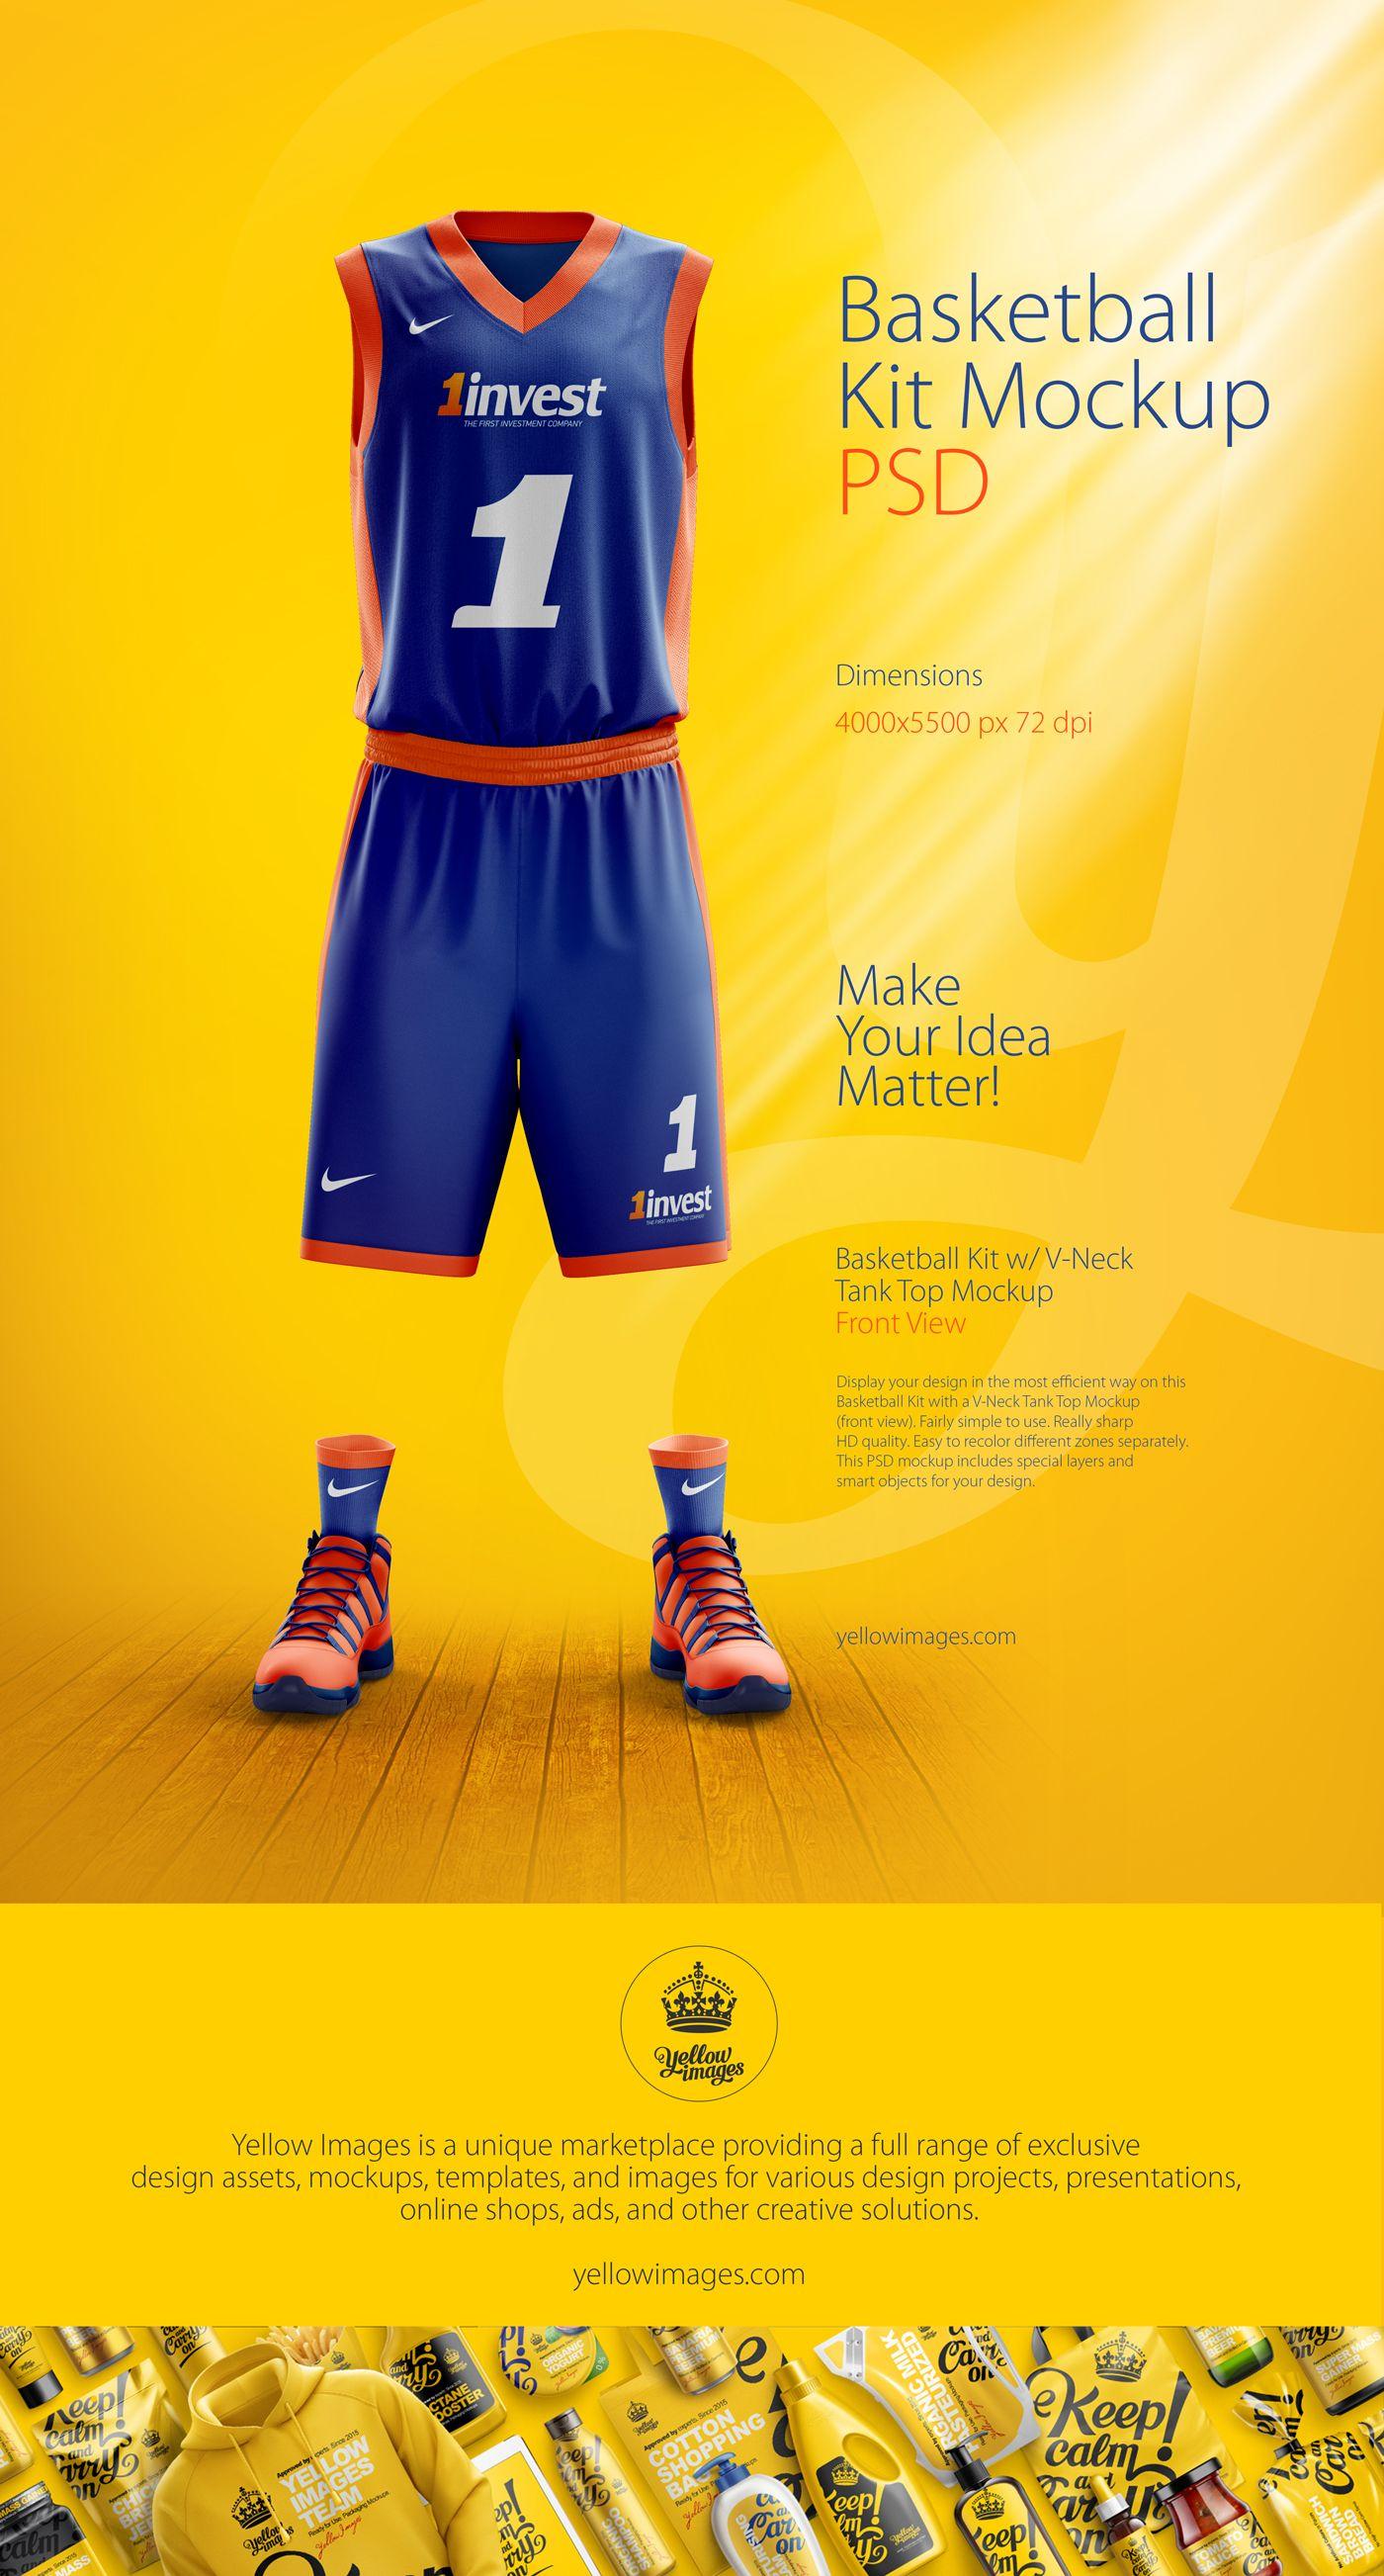 Download Basketball Kit Mockup Psd On Behance Basketball Kit Basketball Uniforms Design Basketball